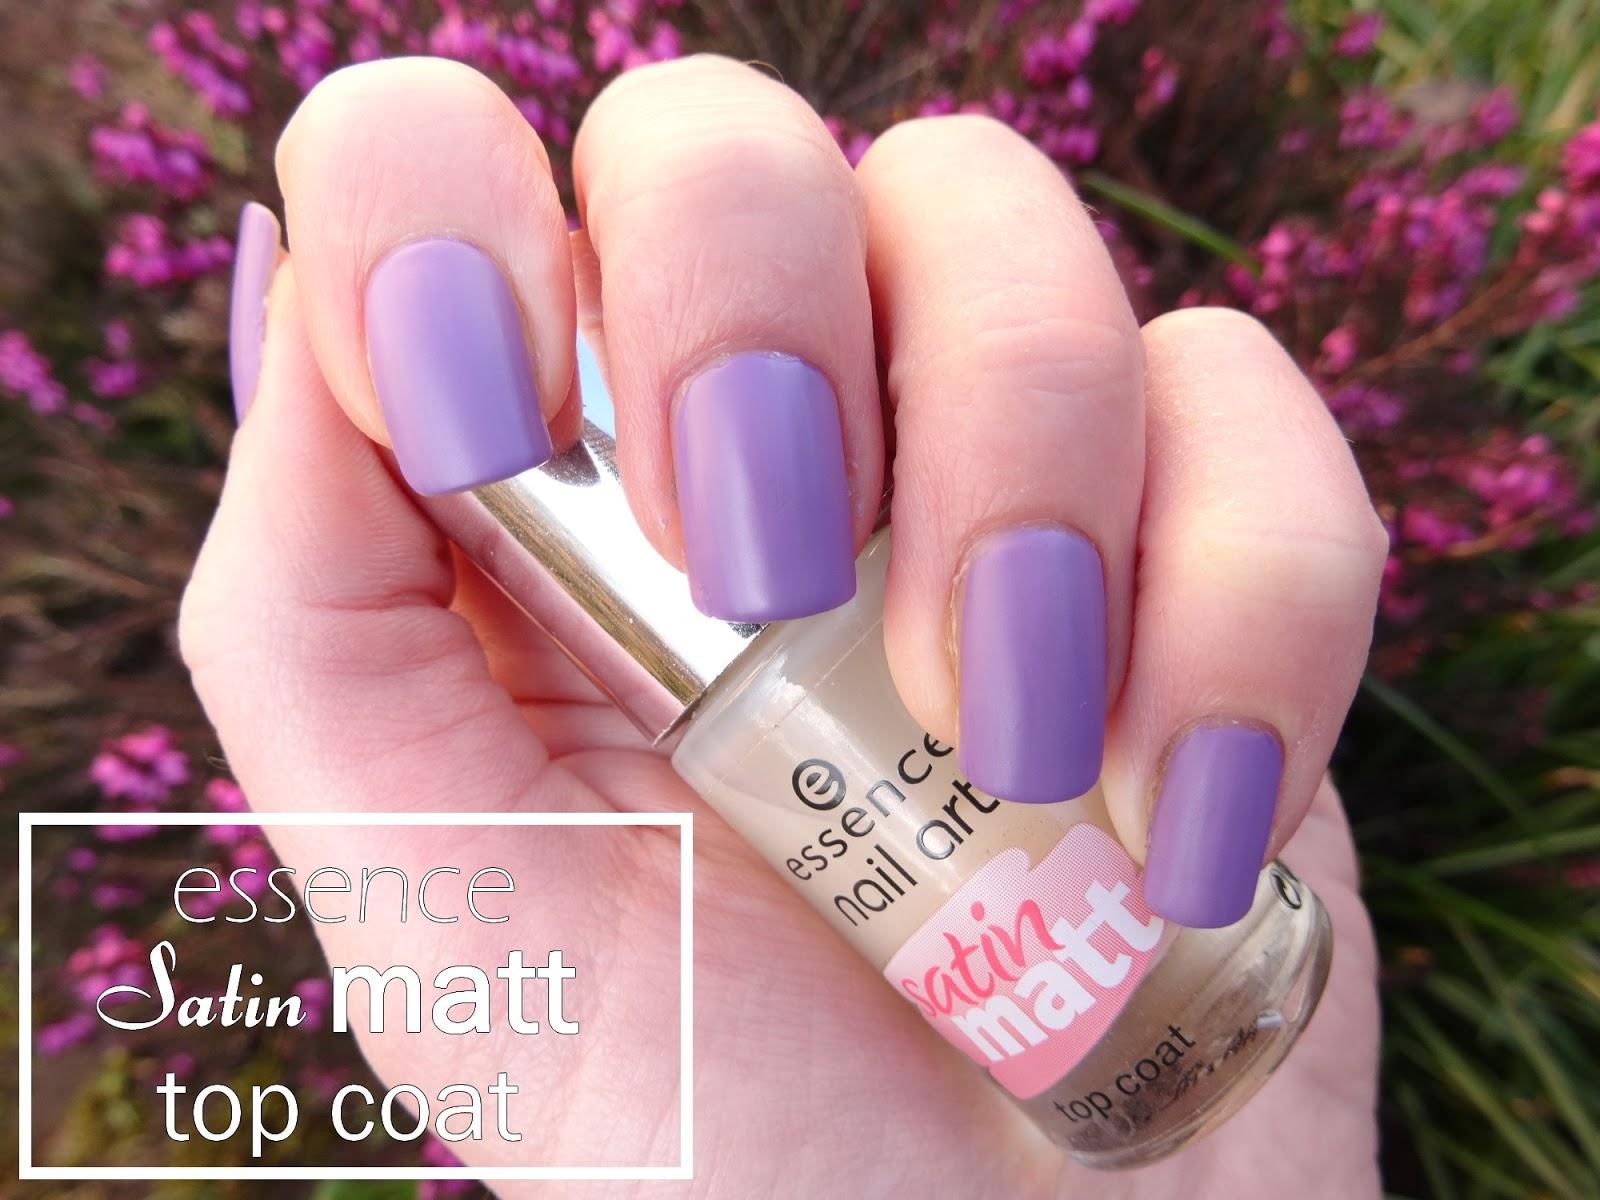 Beauty Blog Essence Satin Matt Top Coat